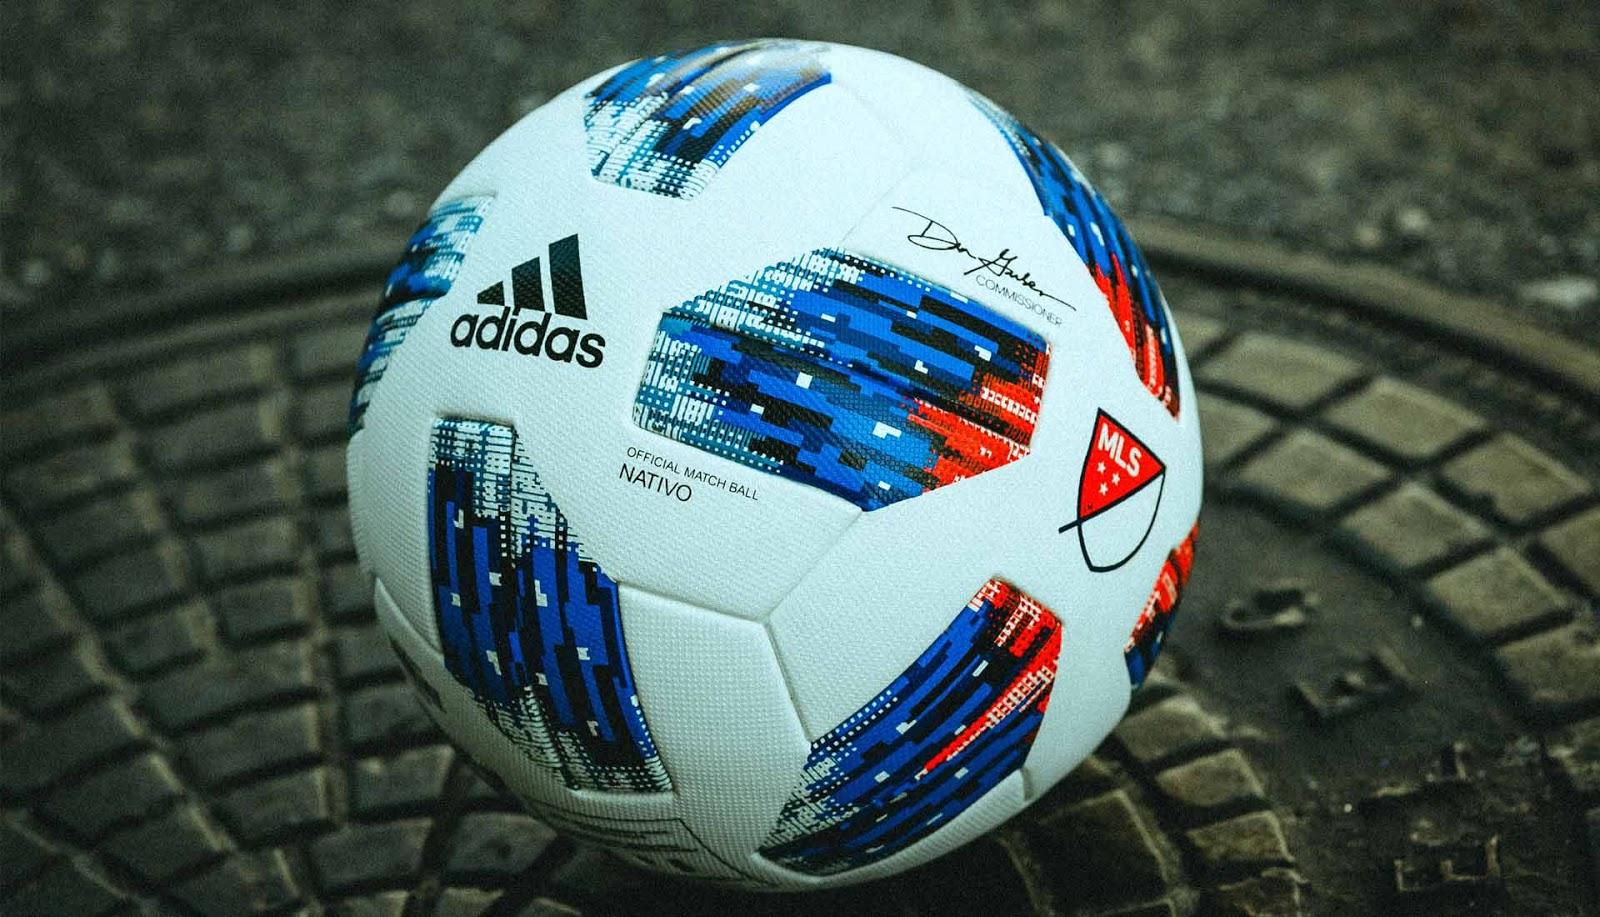 Balls 17-18 by Goh125 - Telstar 18 Mechta - Page 8 Adidas-2018-mls-ball%2B%25282%2529